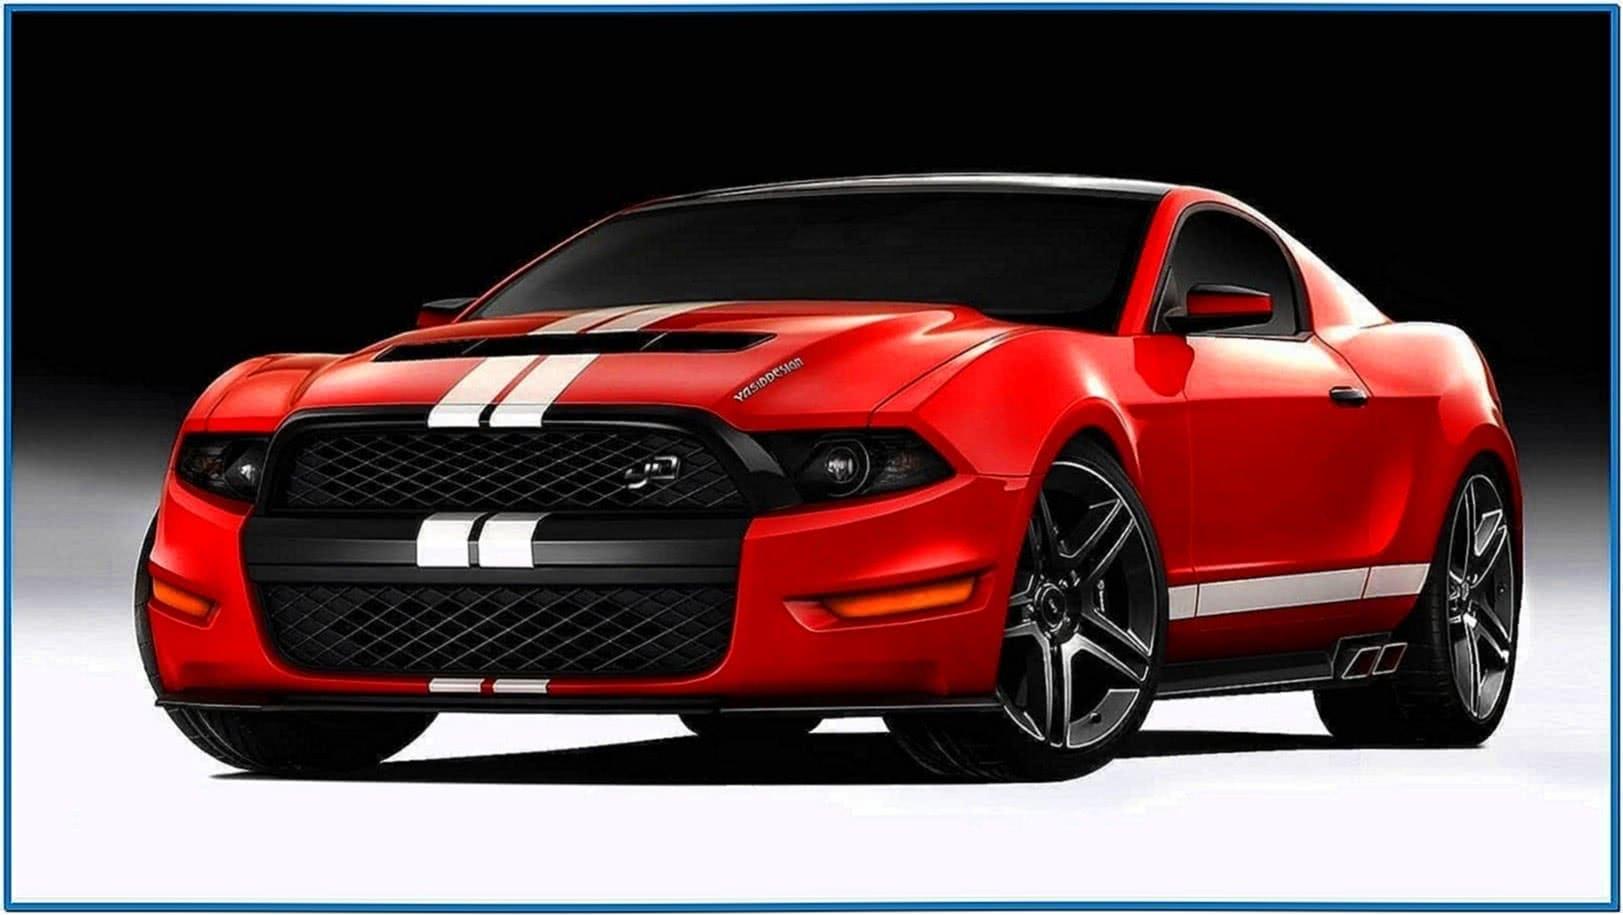 Screensaver Ford Focus 2020